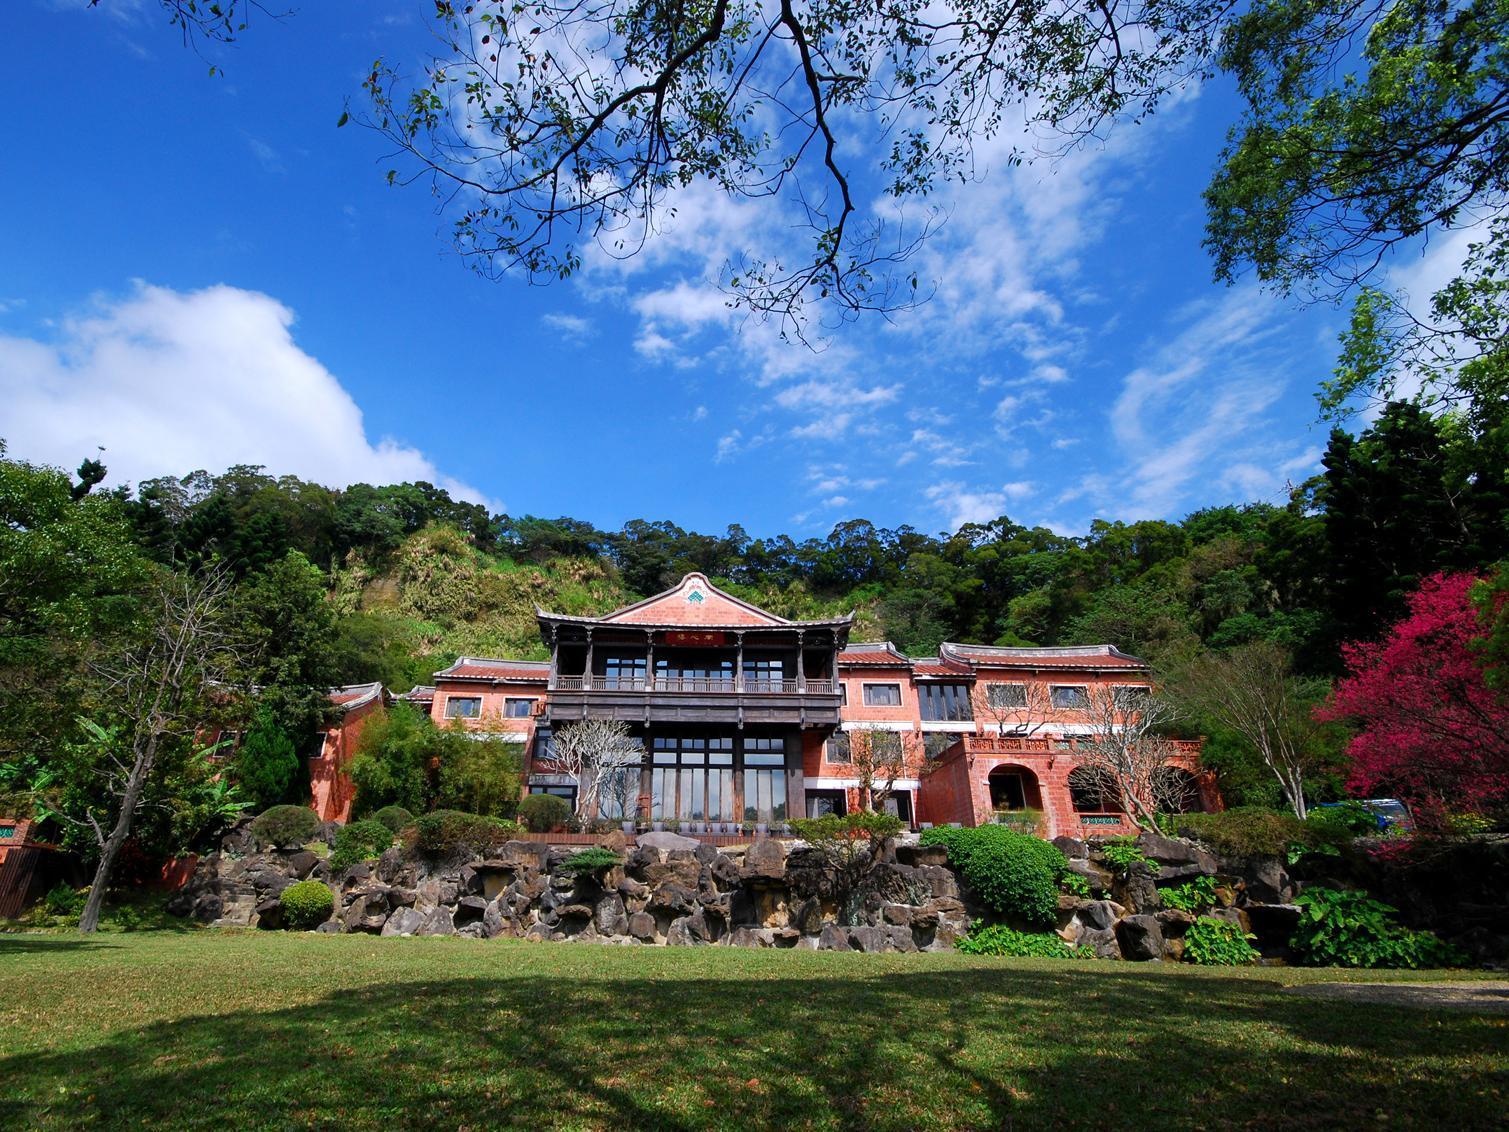 The One Nanyuan Land of Retreat & Wellness, Hsinchu County